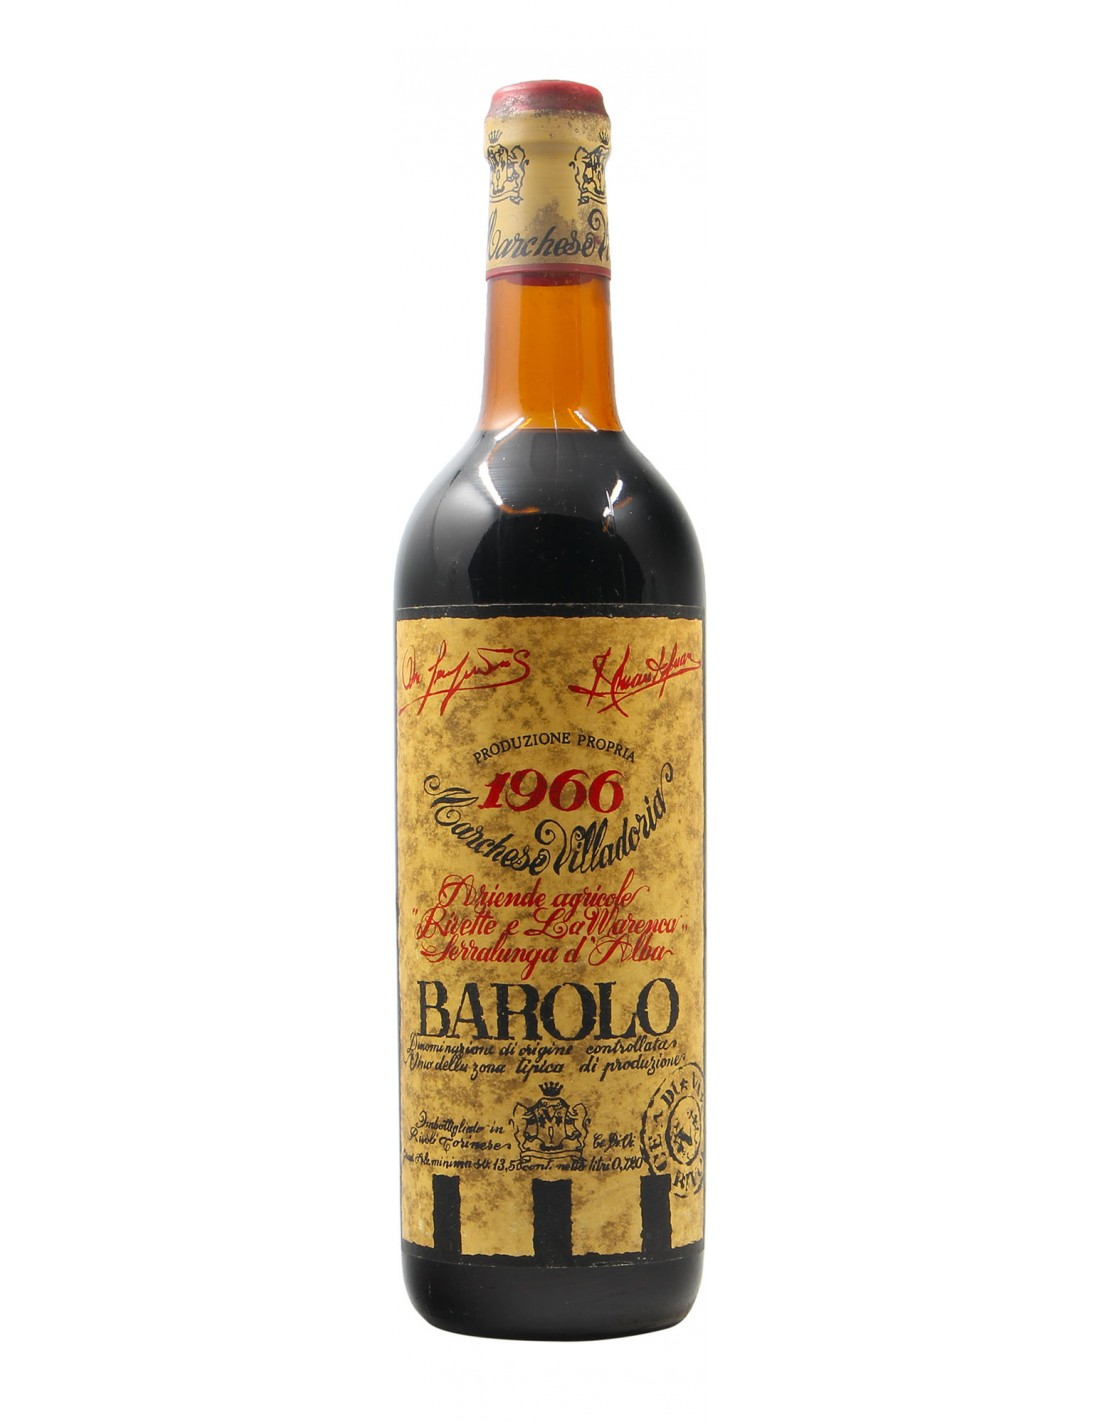 Barolo 1966 VILLADORIA GRANDI BOTTIGLIE